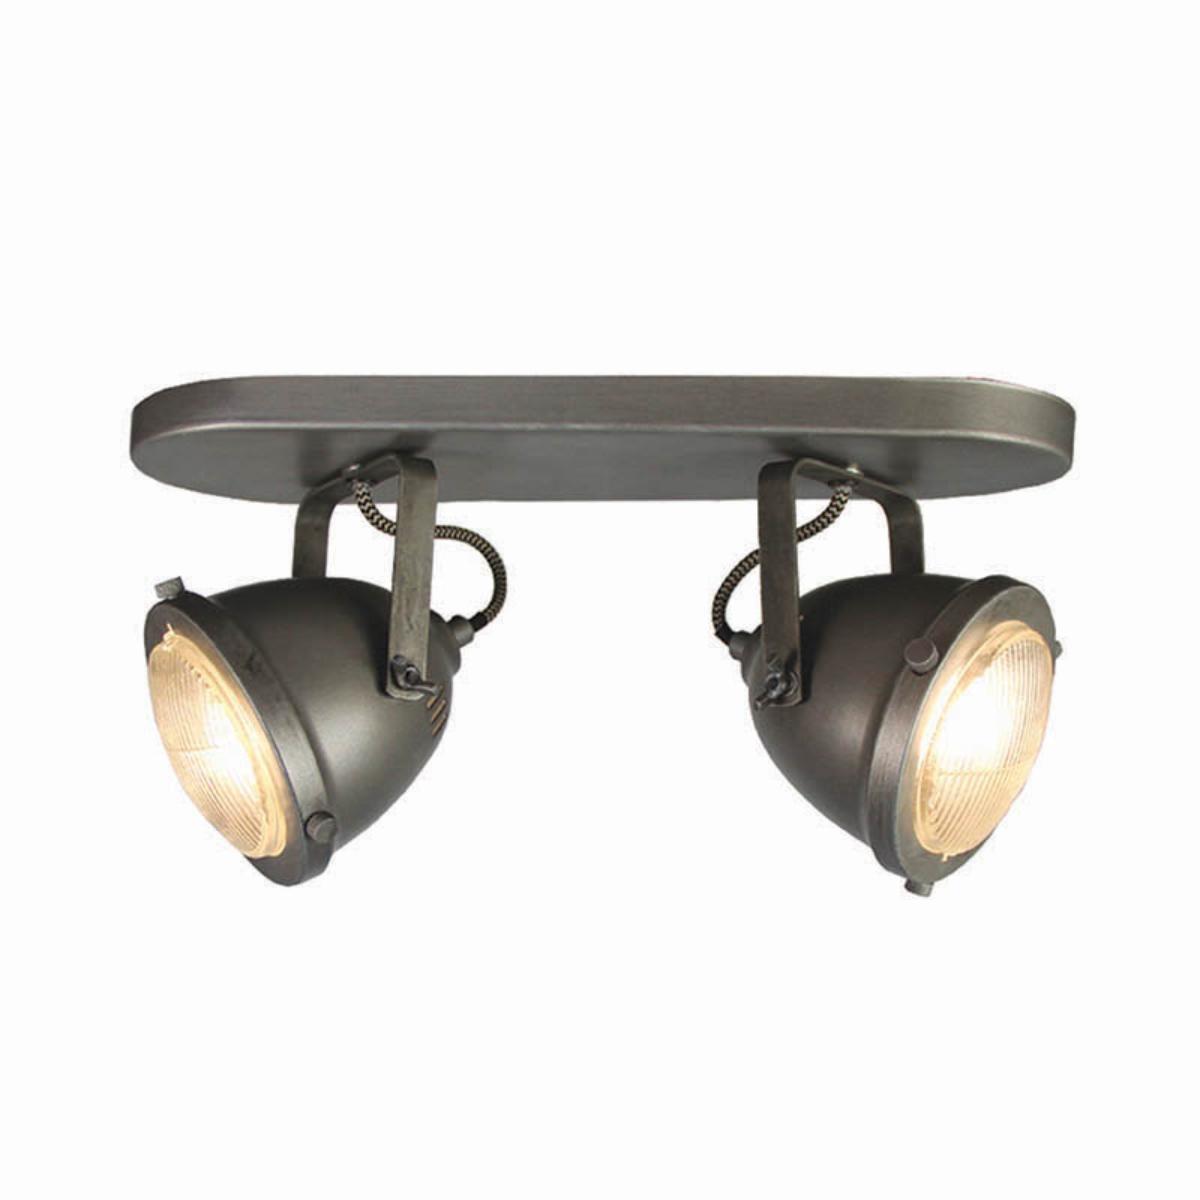 Spot Moto led - Burned Steel - Metaal - 2 Lichts